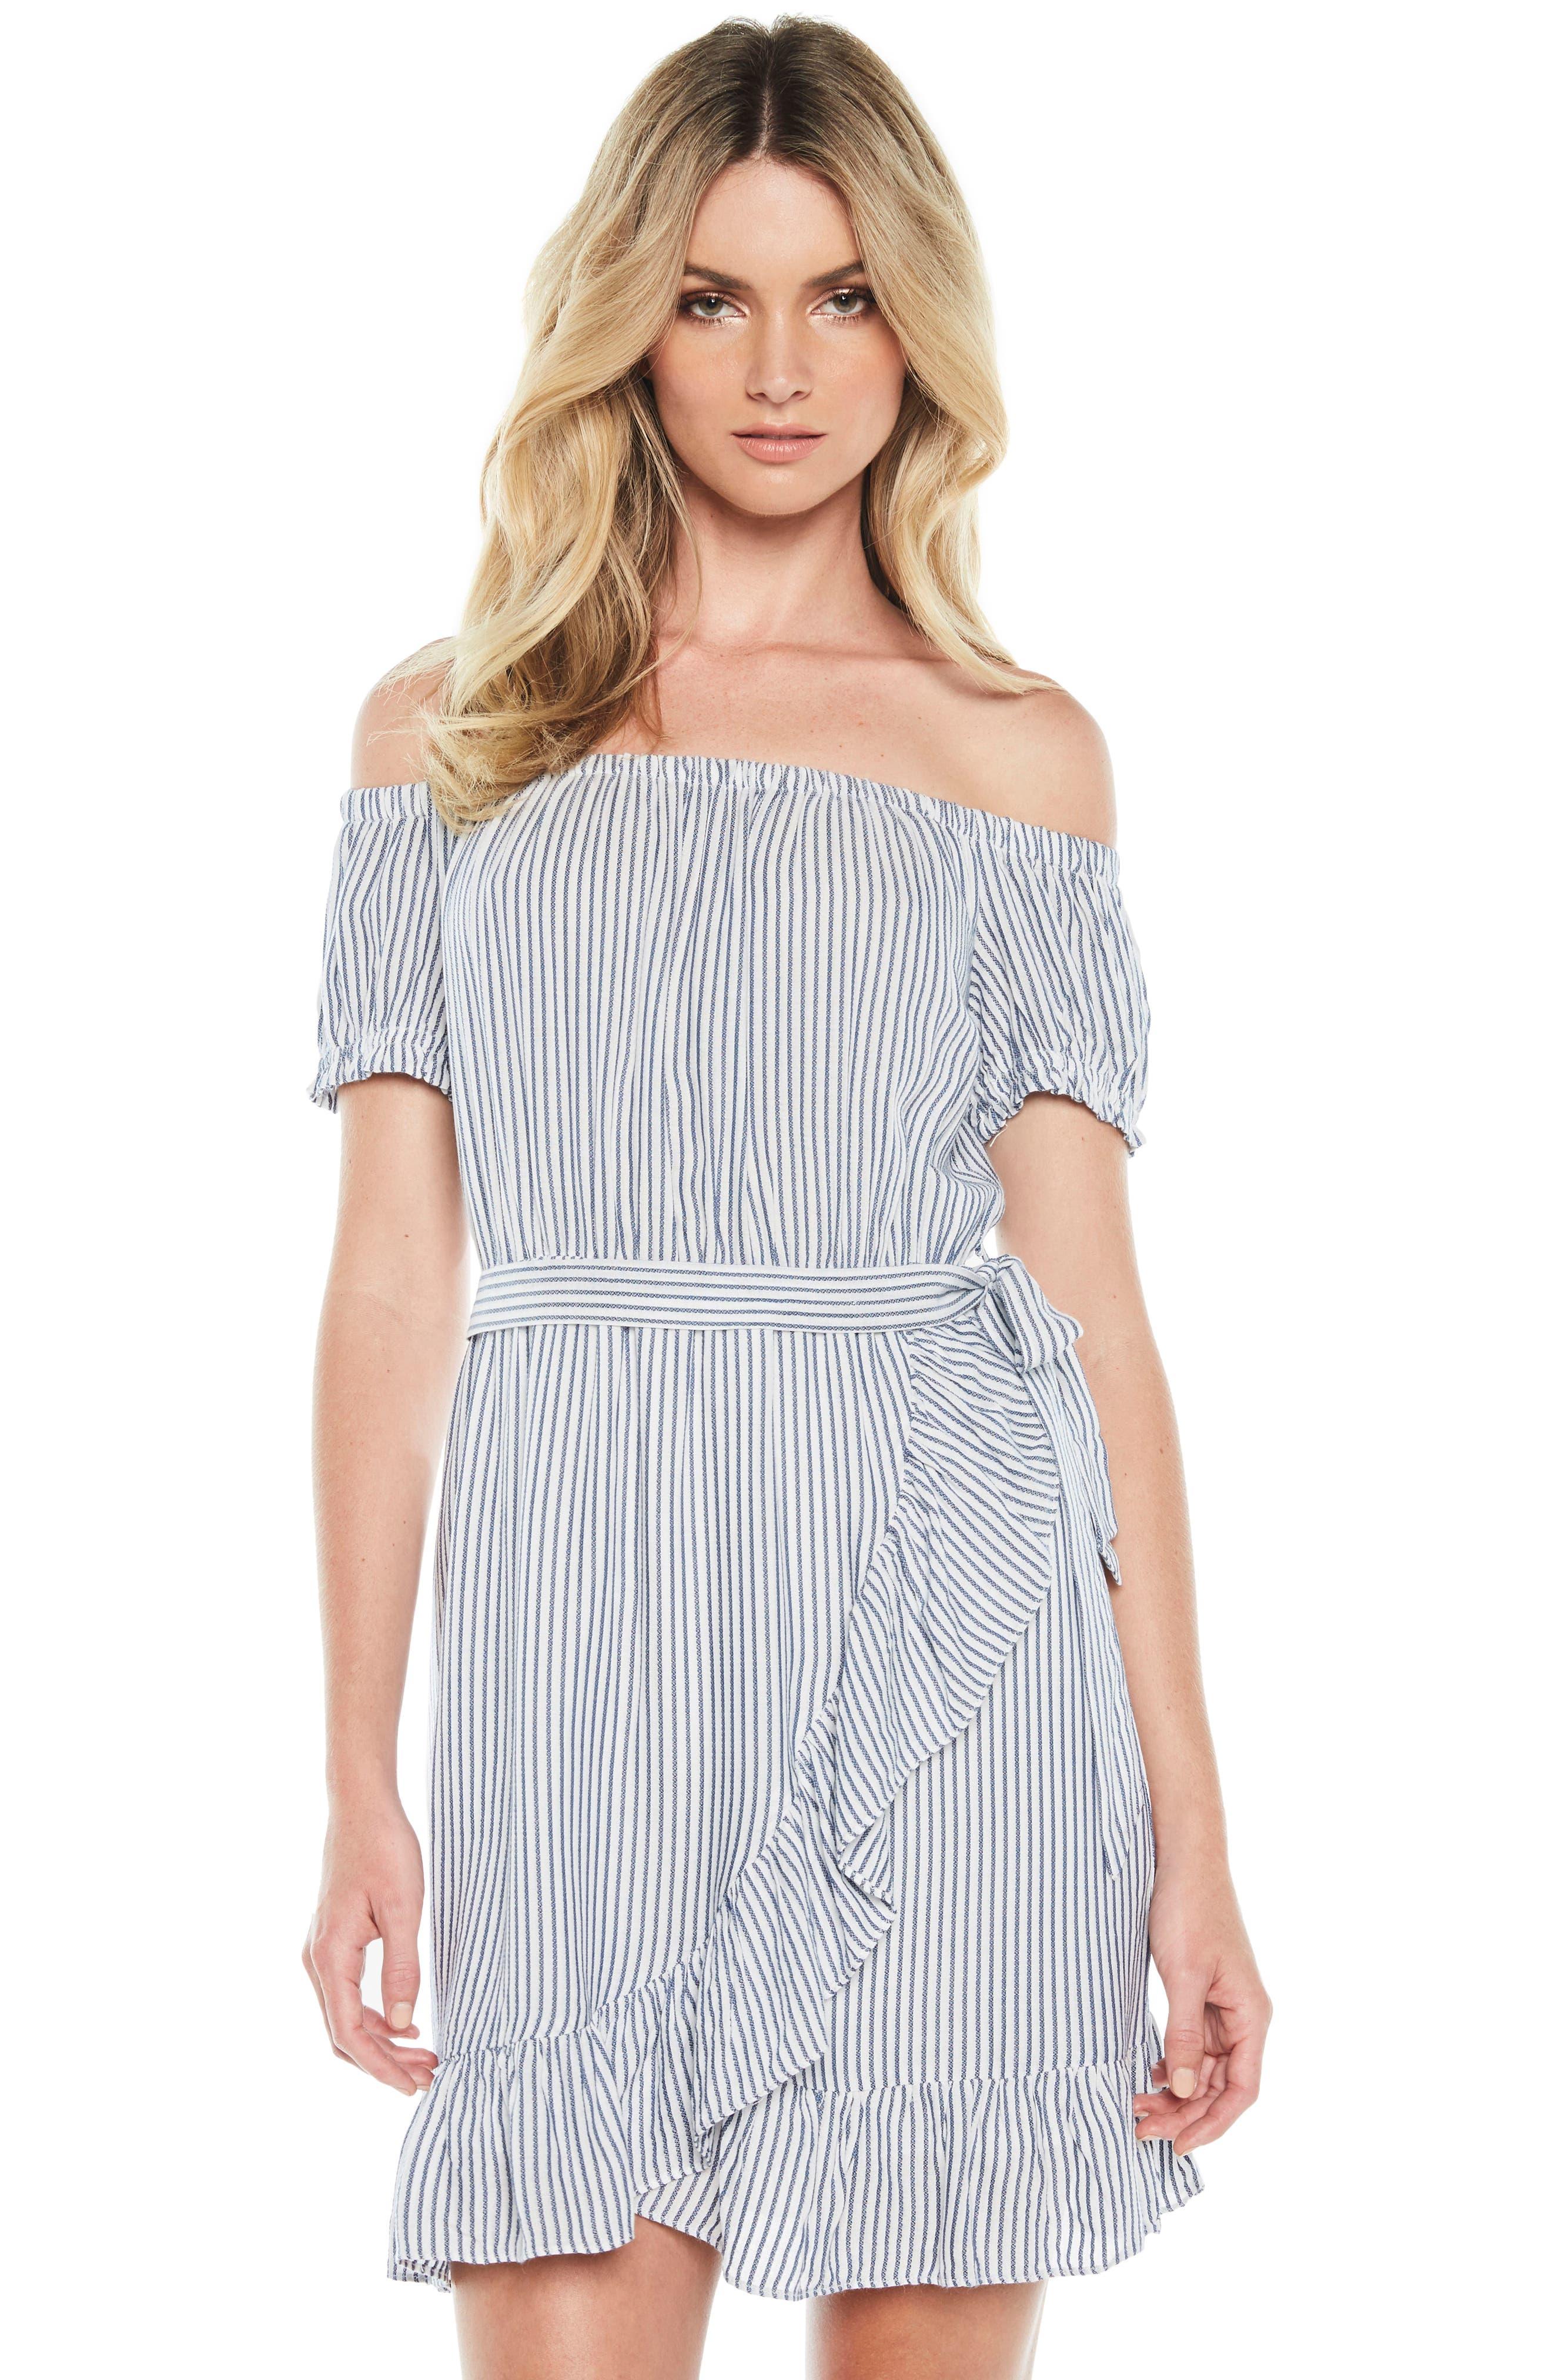 Bobbi Off the Shoulder Stripe Dress,                             Alternate thumbnail 5, color,                             Blue/ White